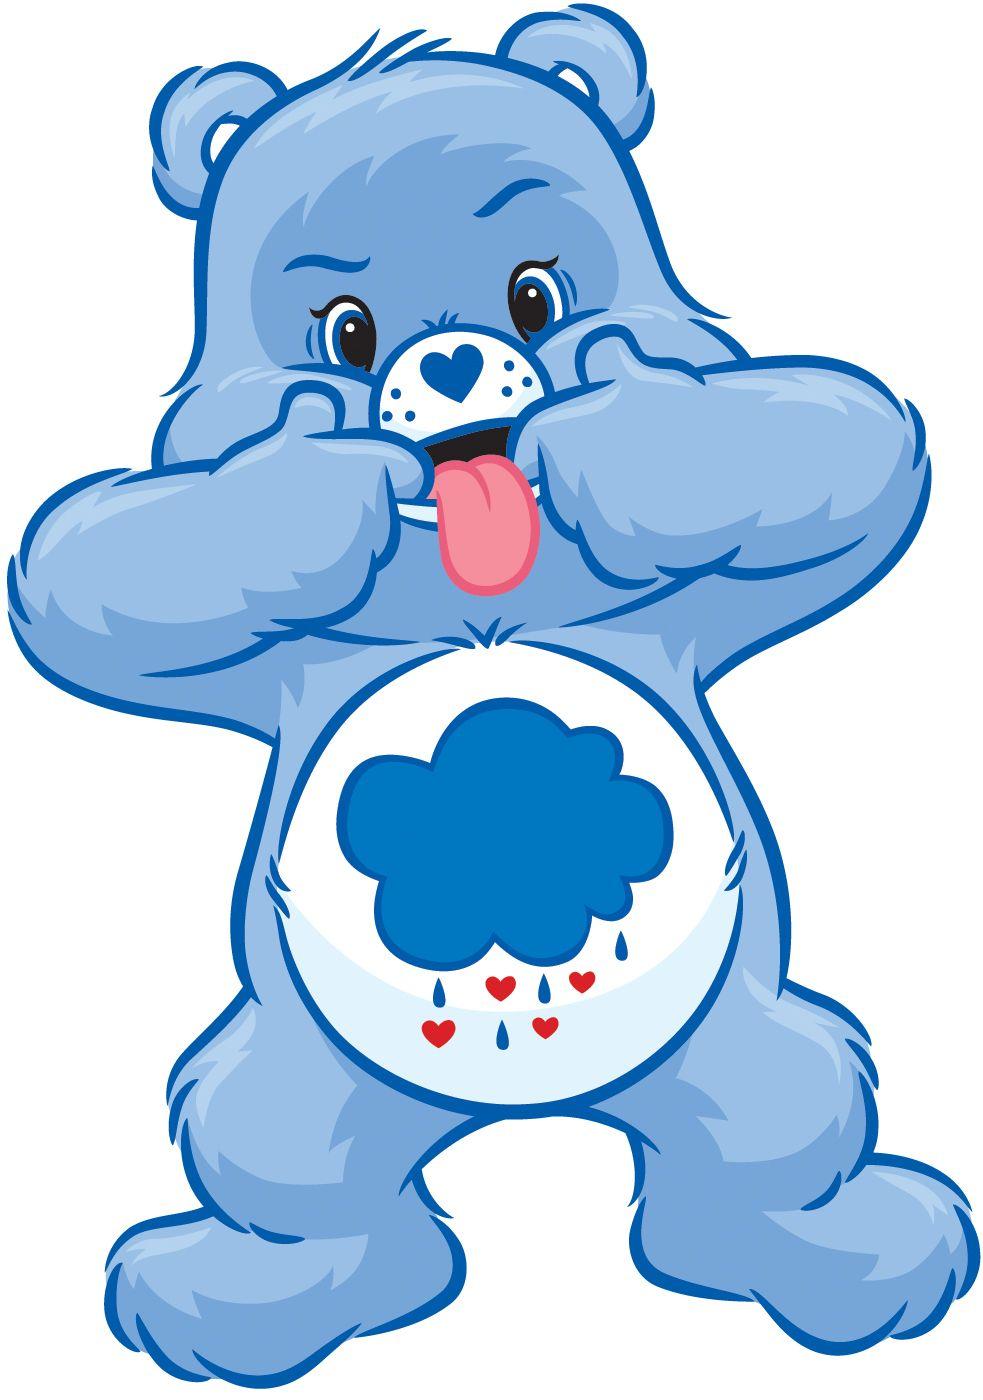 Grumpy Bear at his best! Lol!.